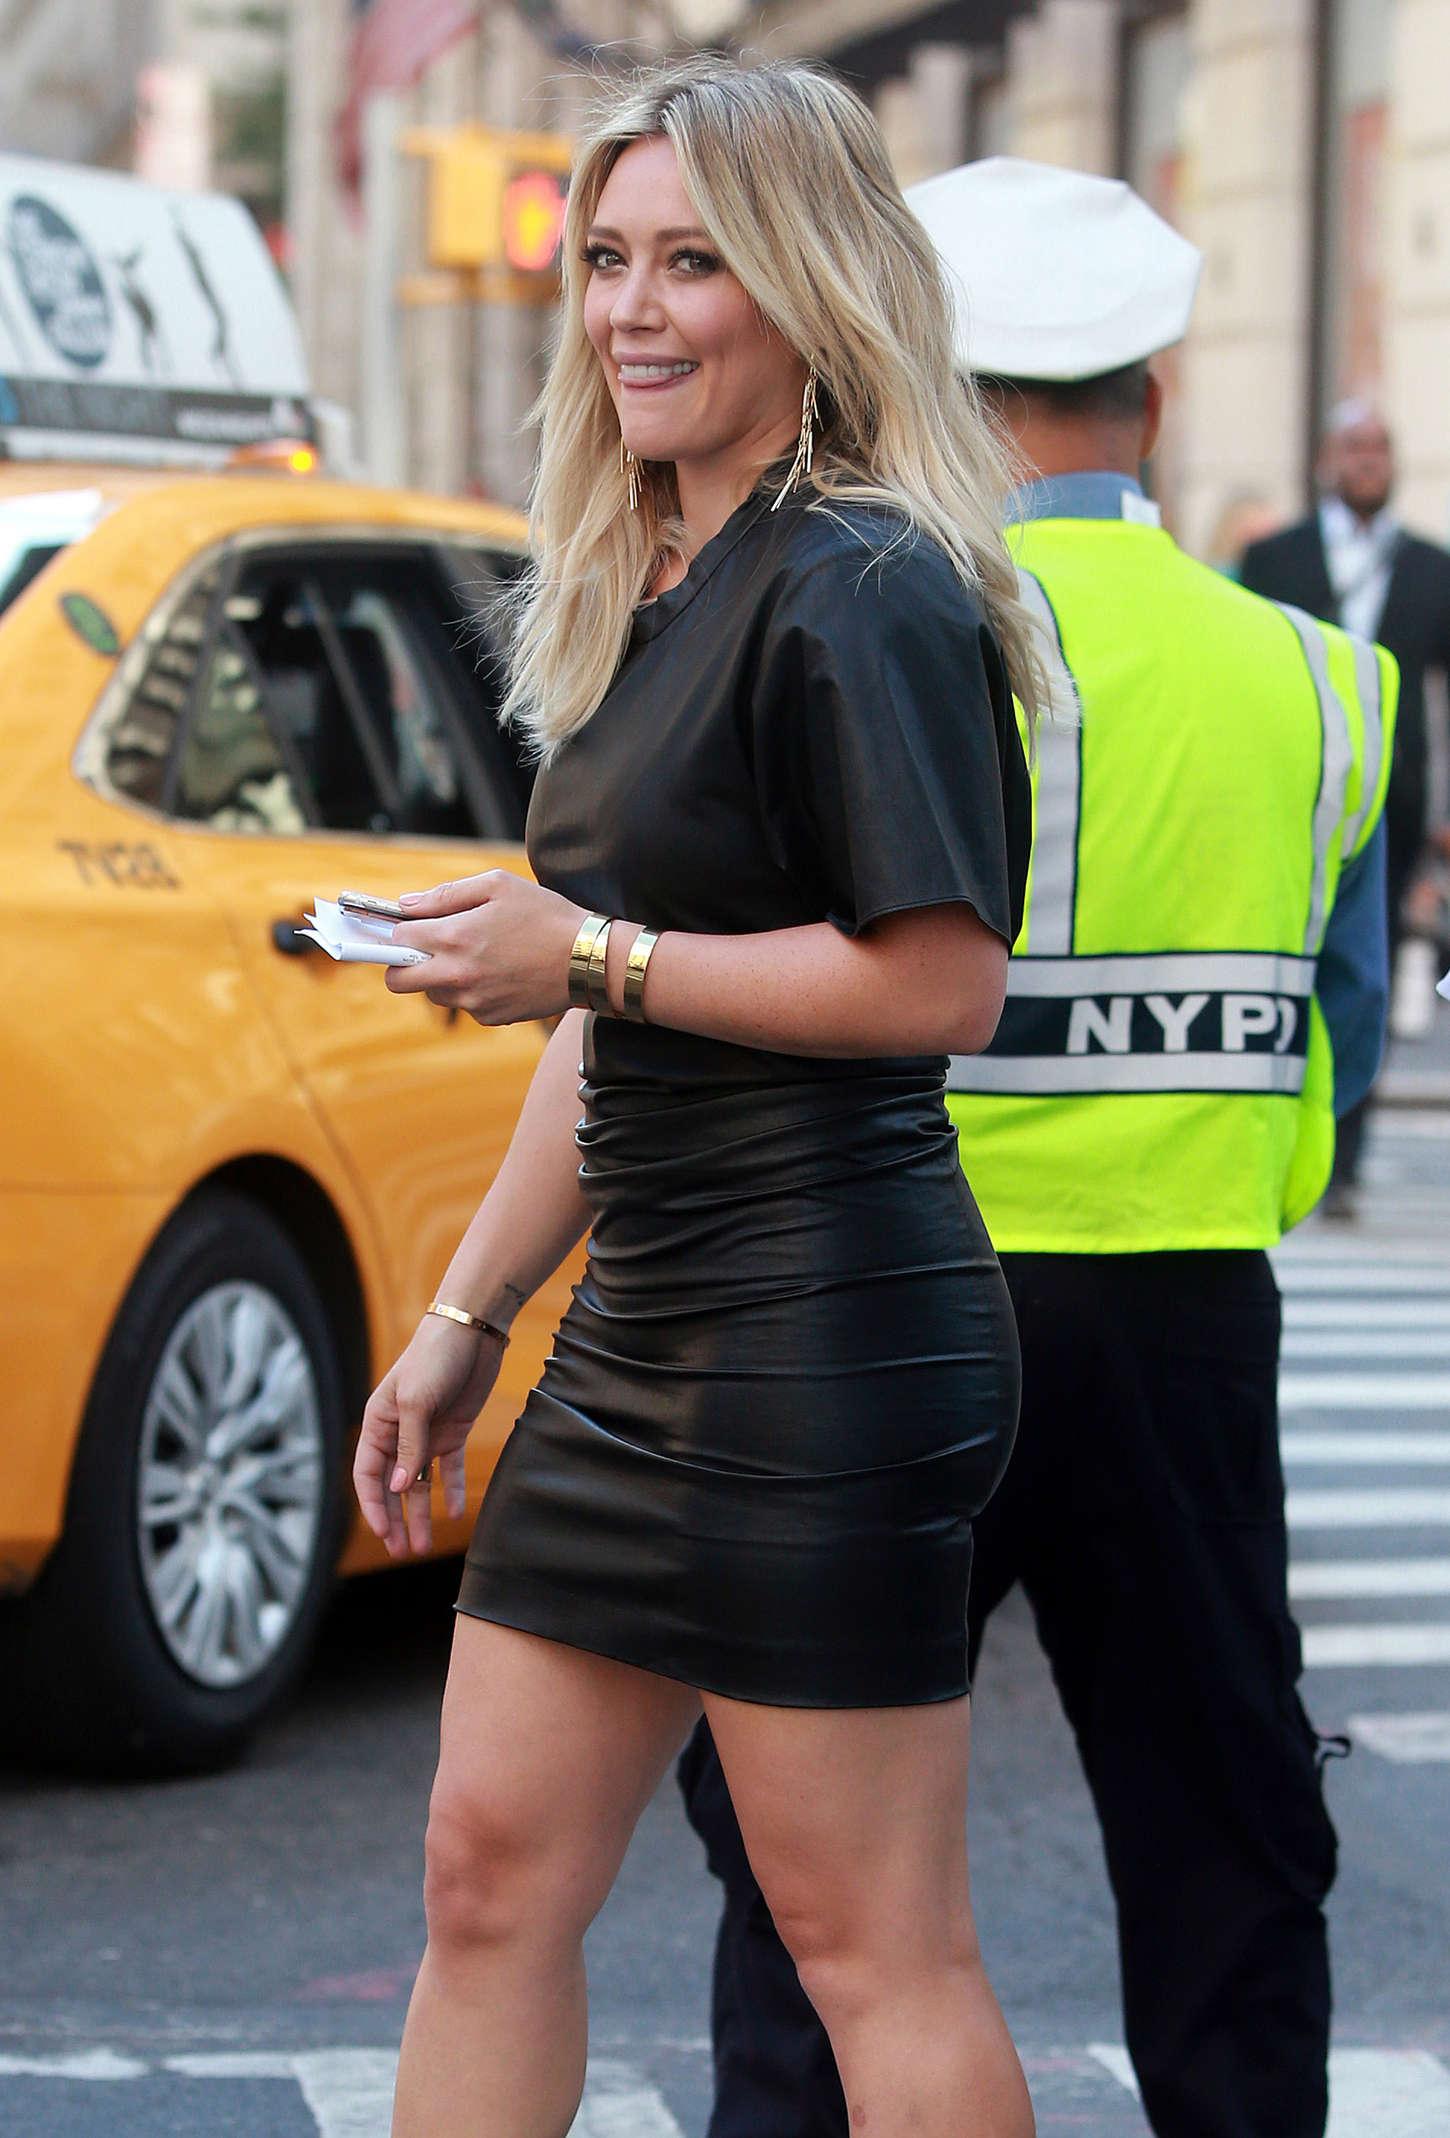 Hilary Duff in Short Mini Dress -15 - GotCeleb Jessica Biel